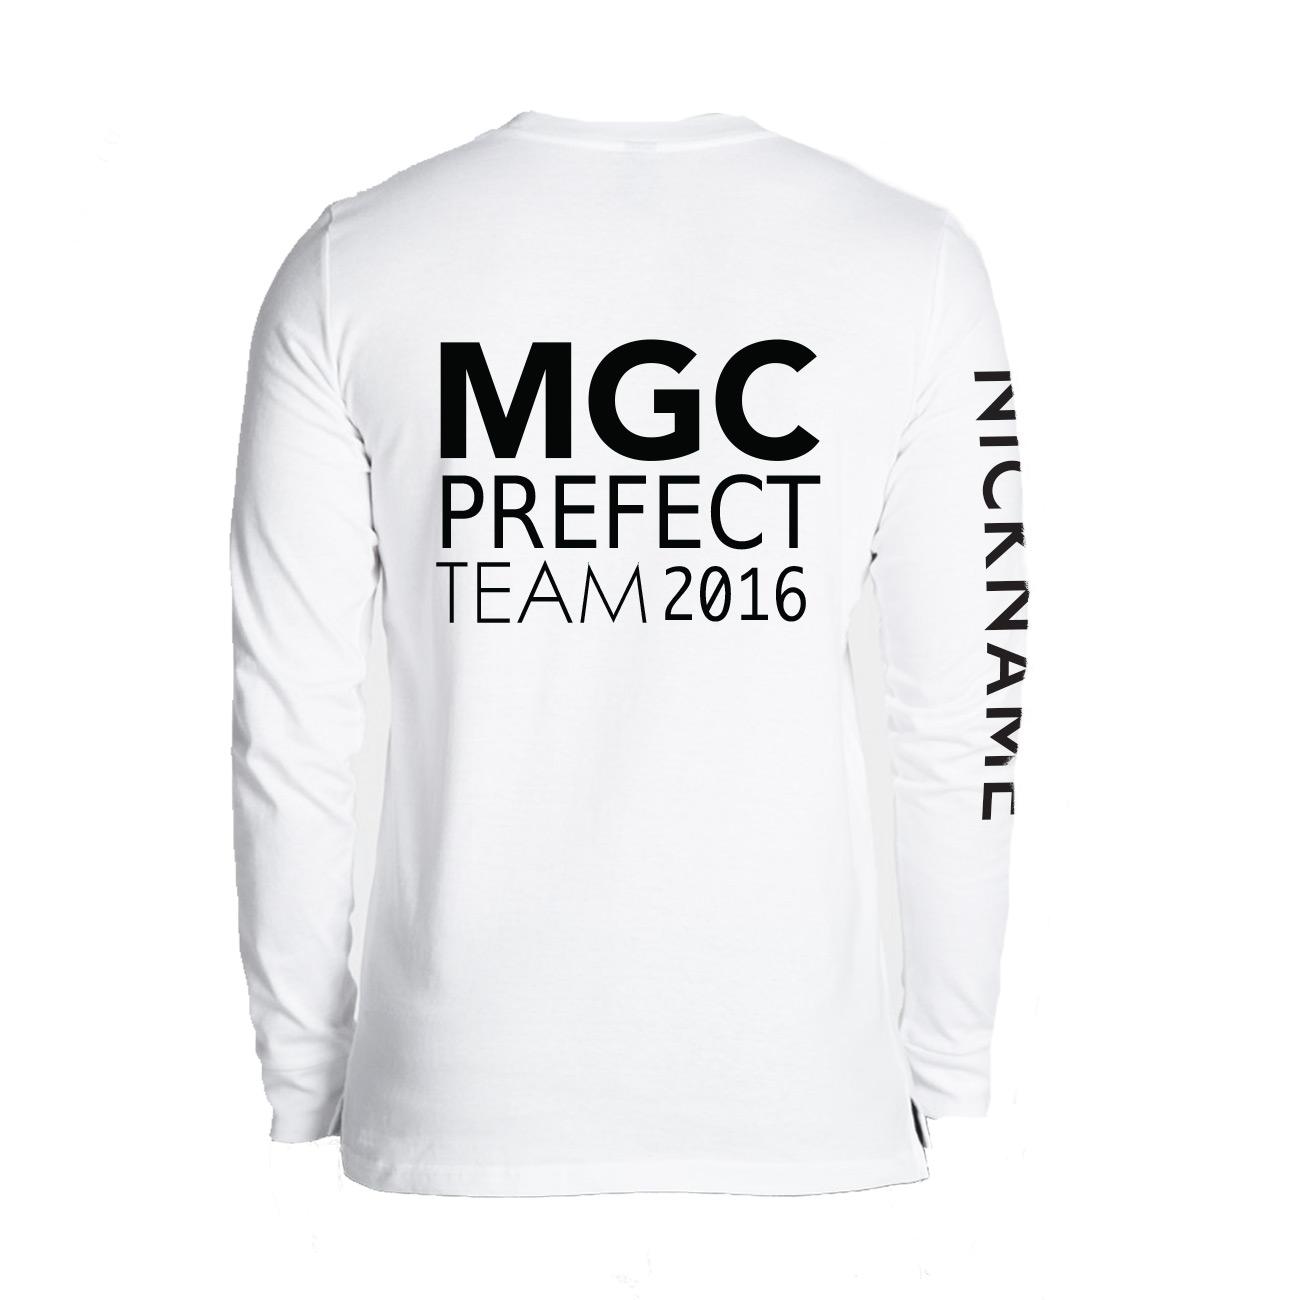 MGC Leavers Back.jpg